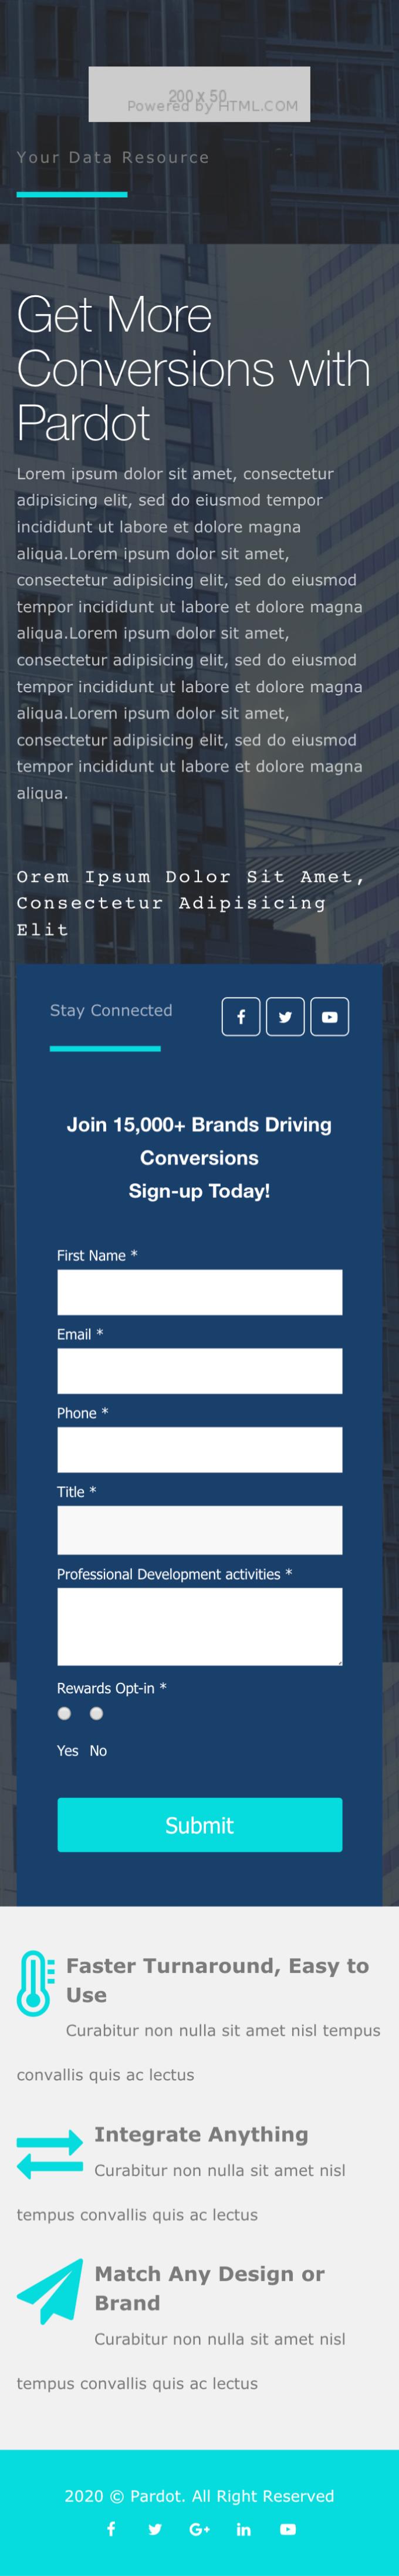 Buy a Pardot Sales Landing Page